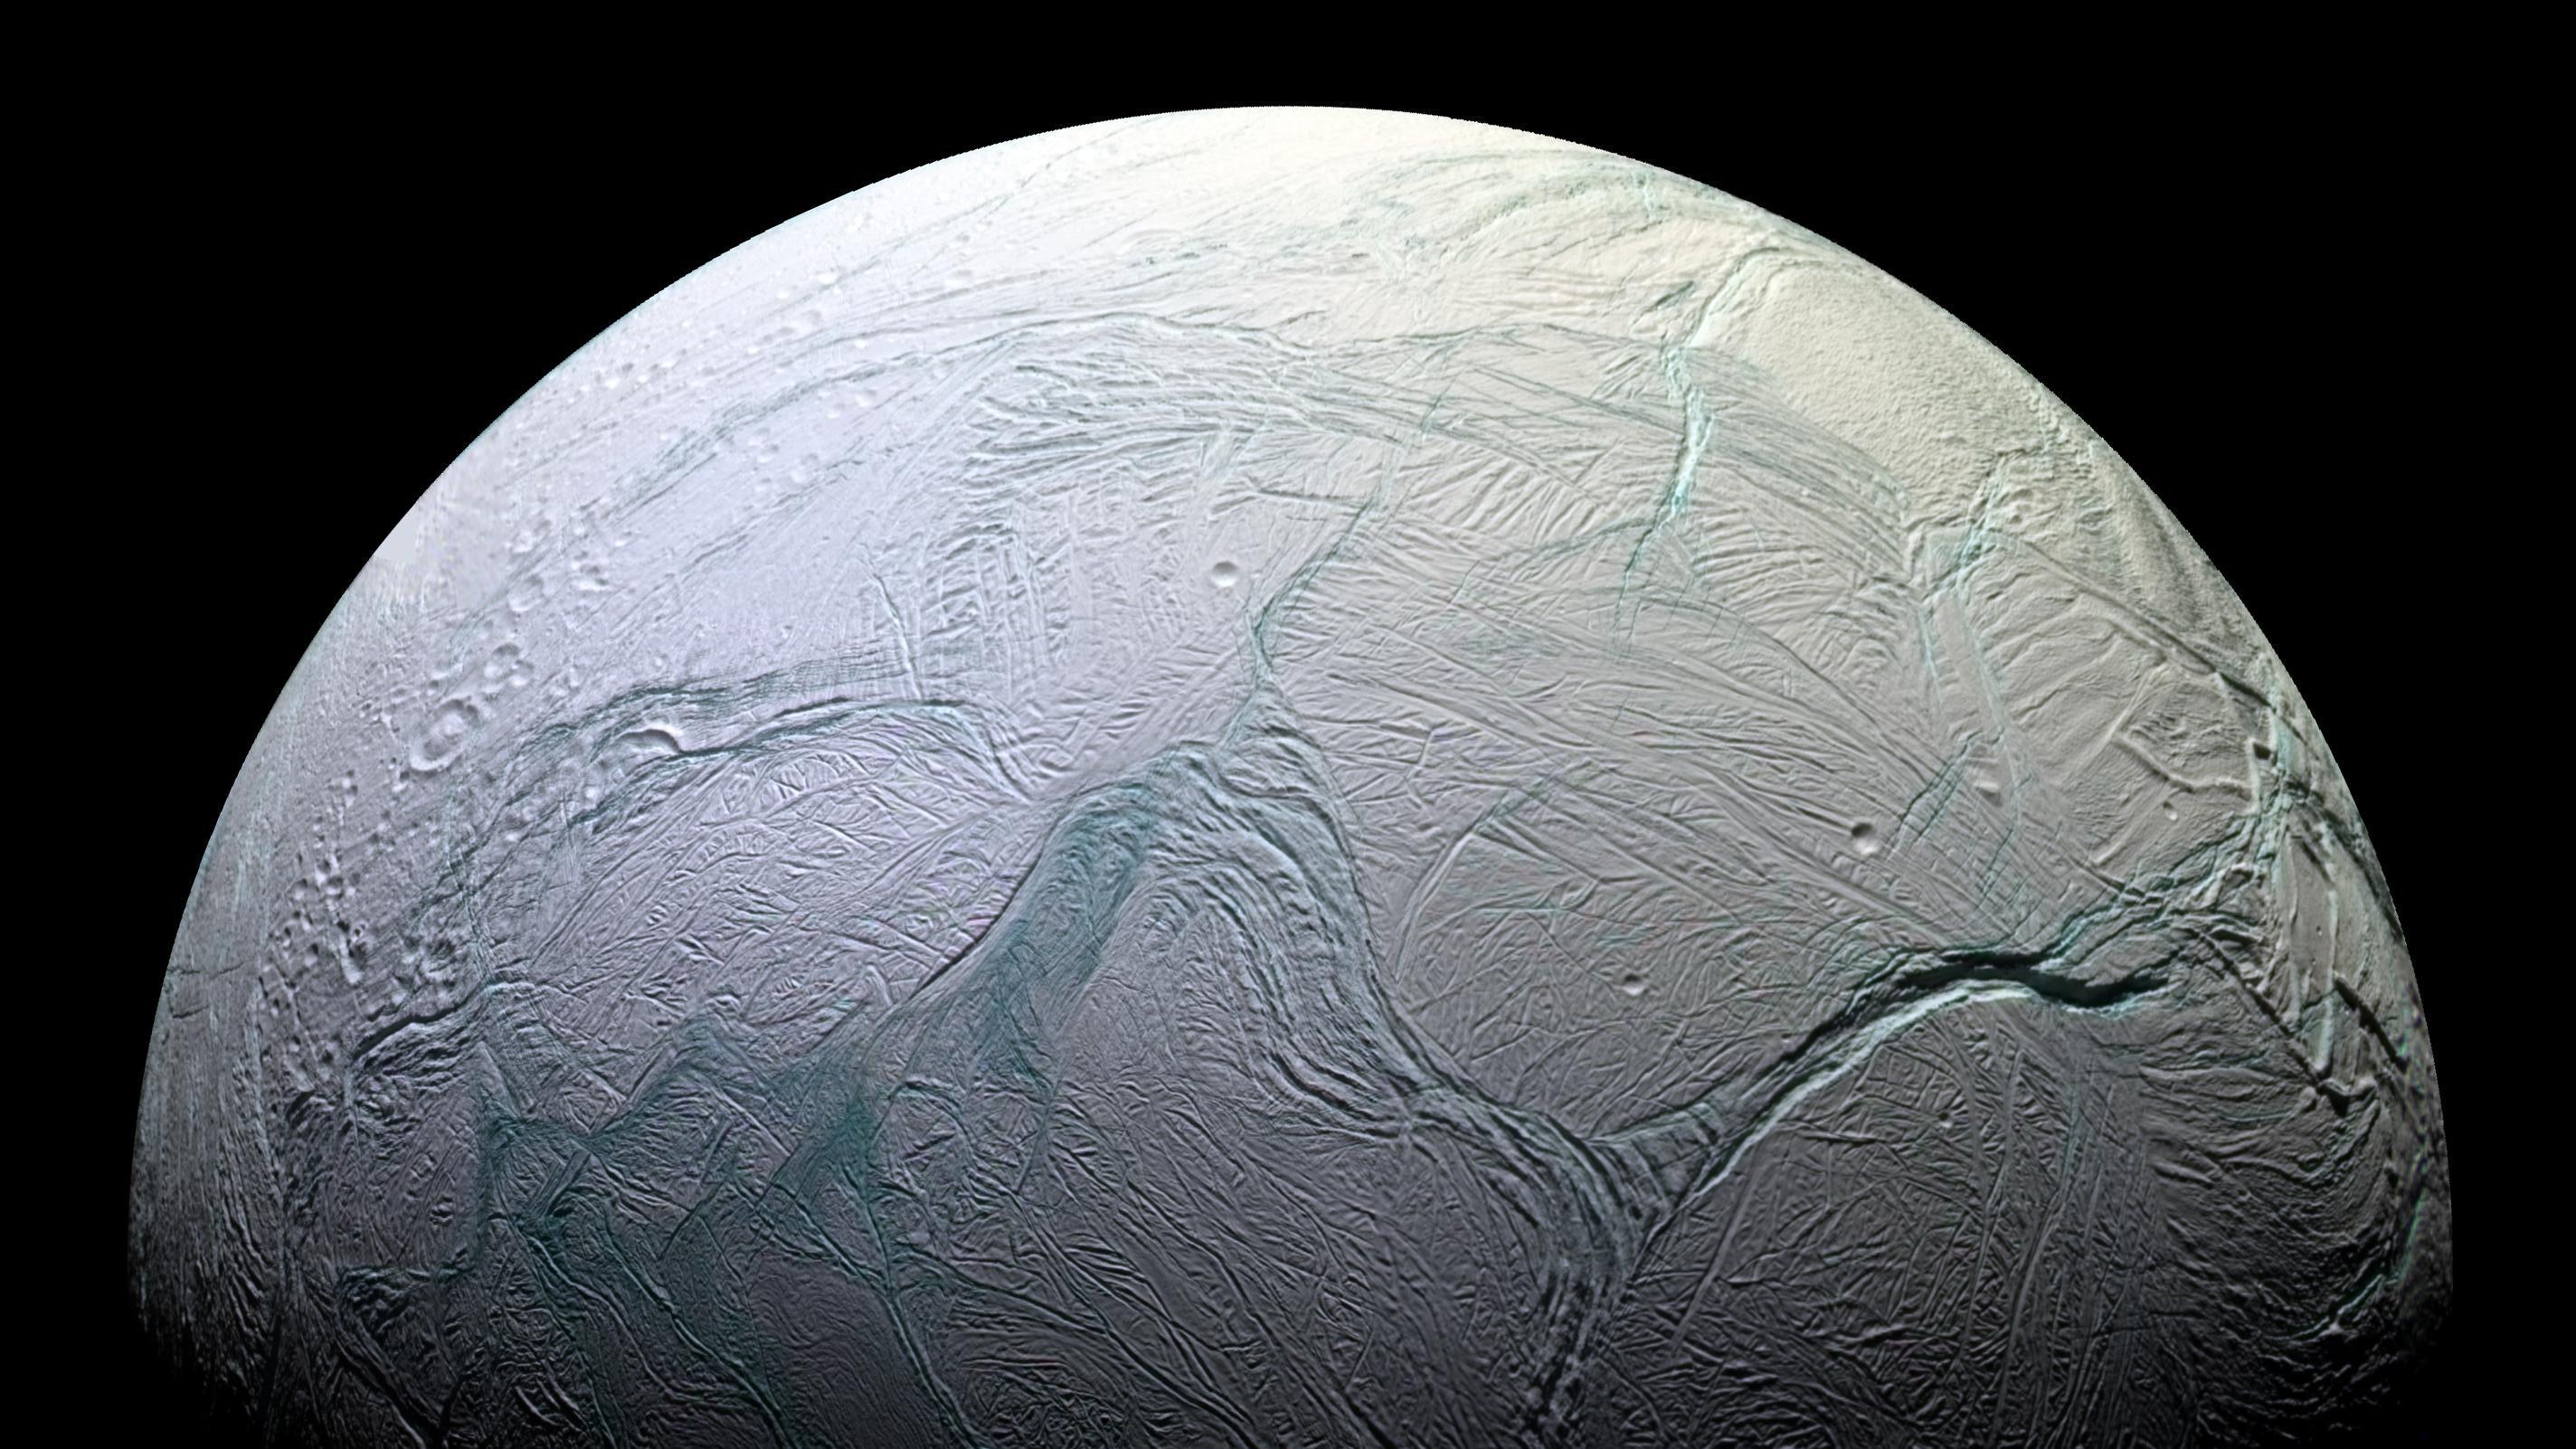 Enceladus' active south polar region in October 2008